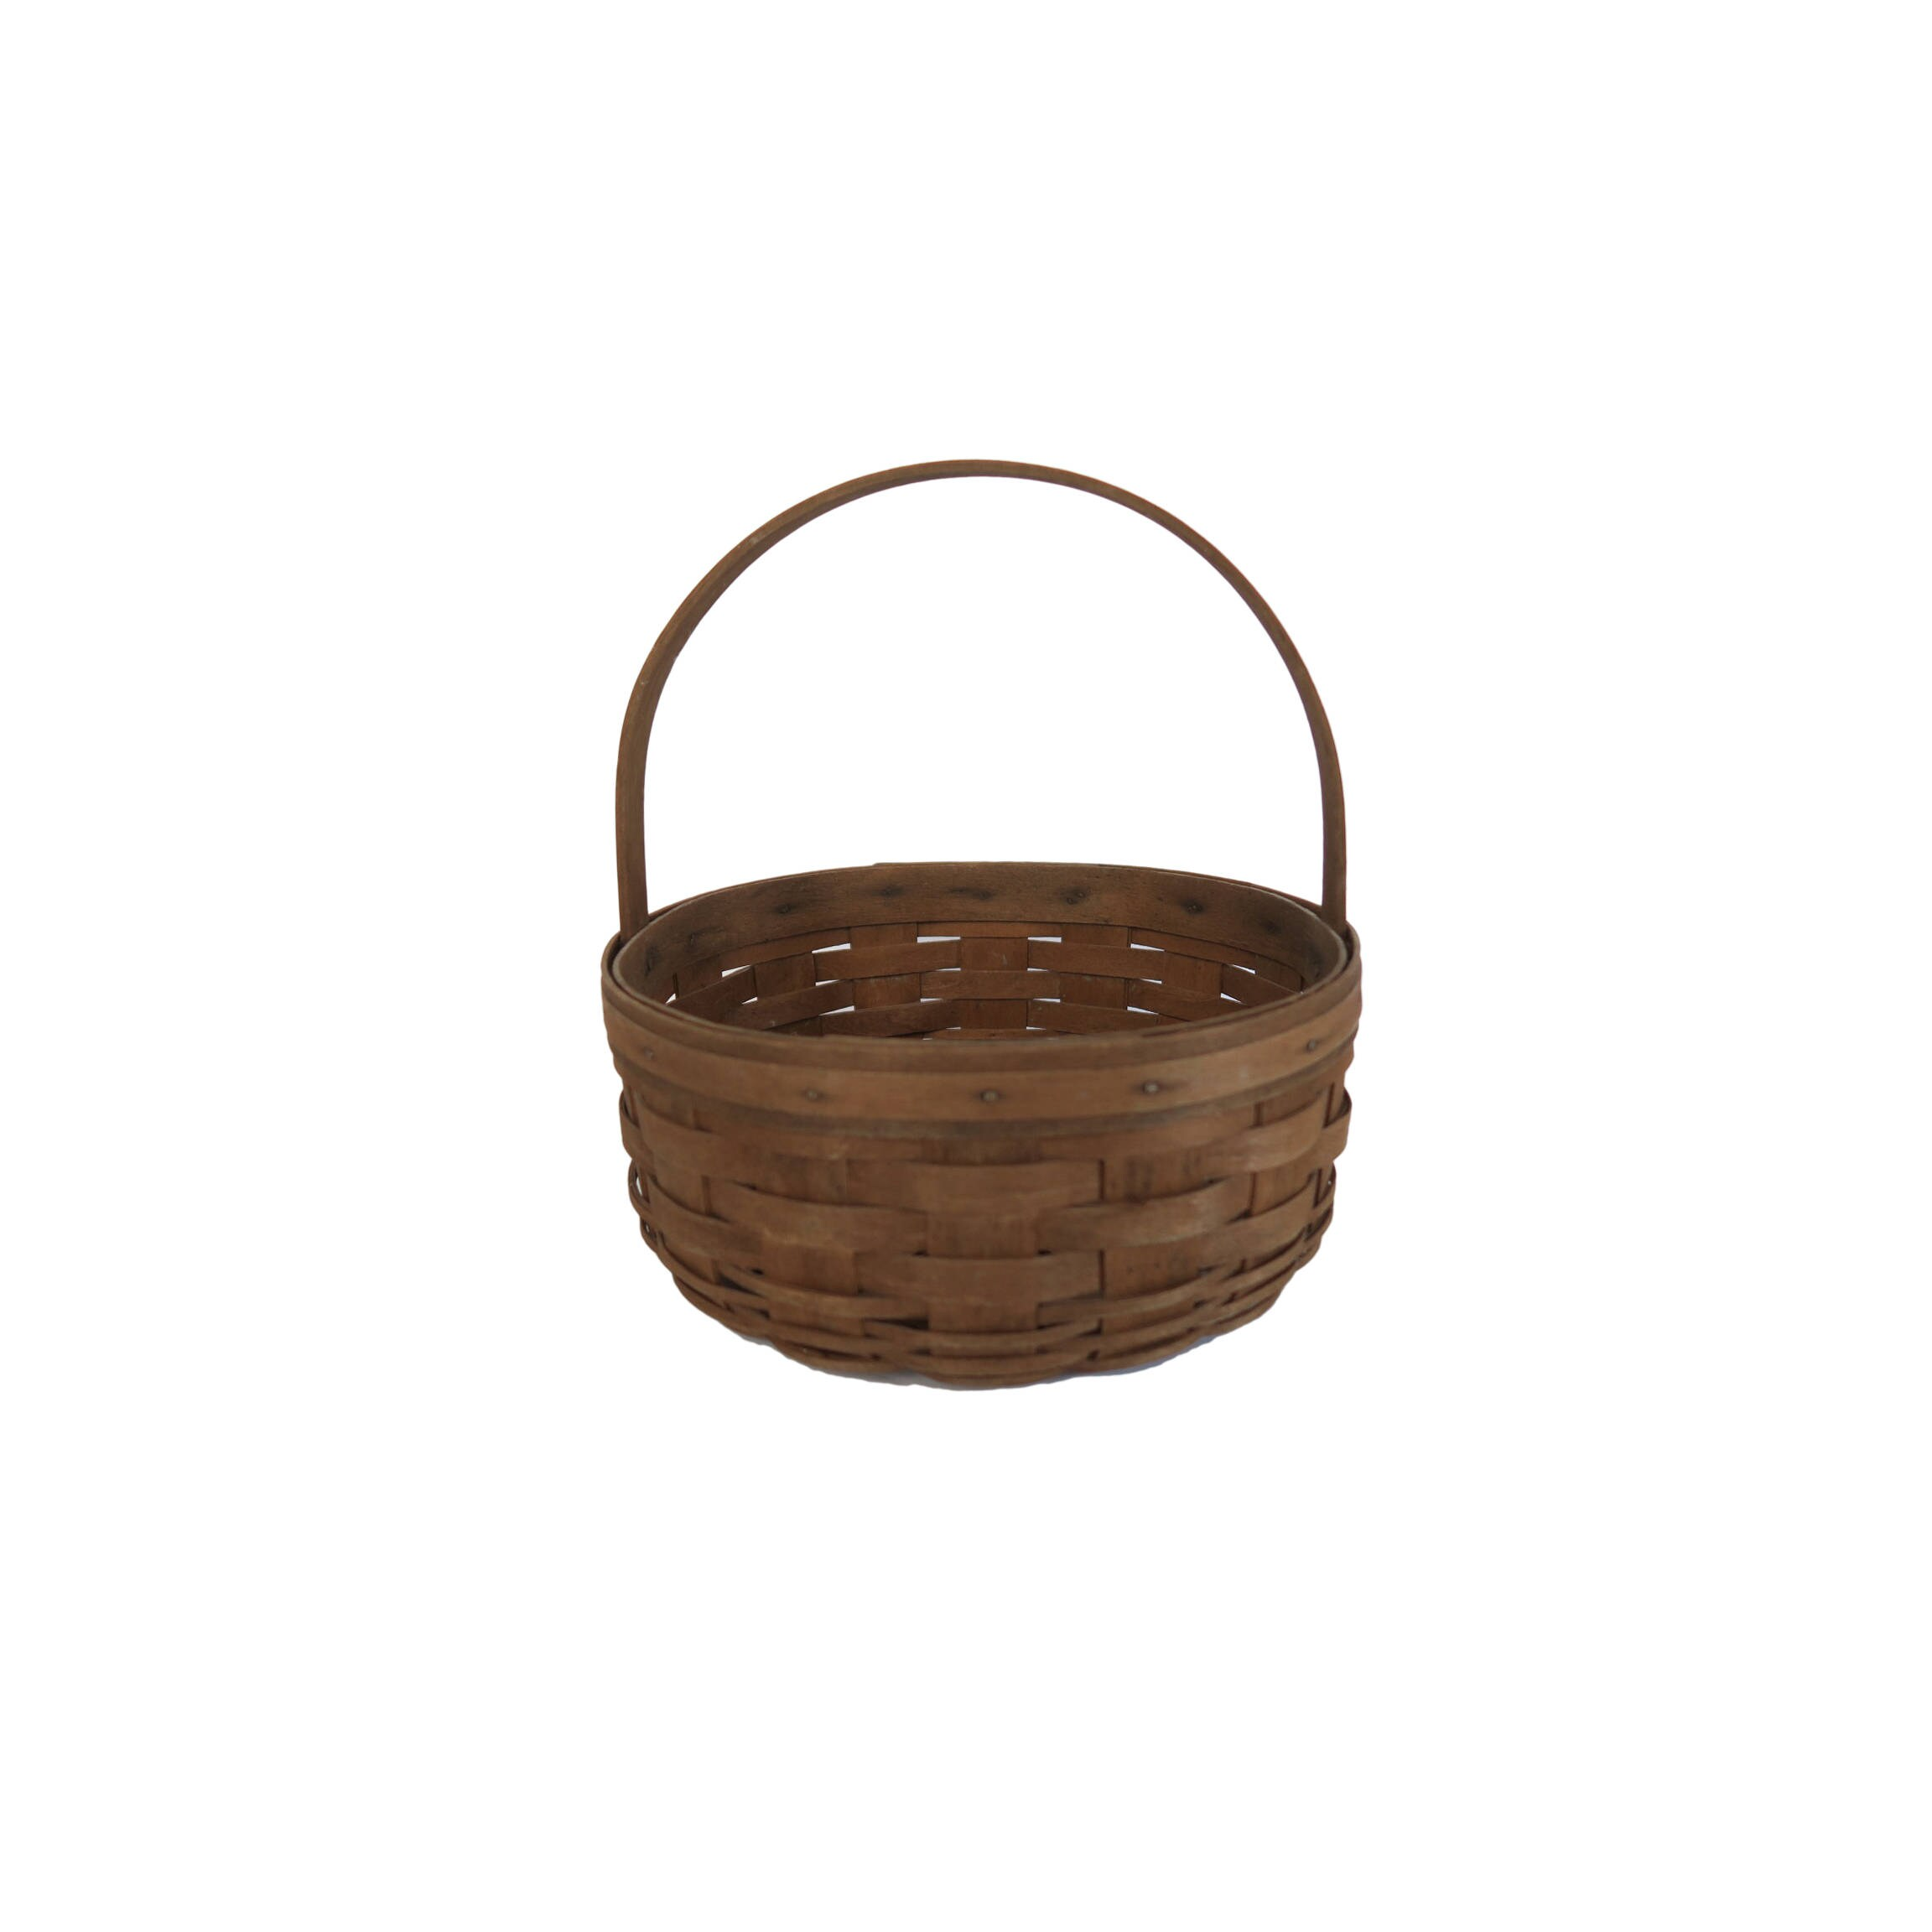 Vintage Longaberger Large Round Woven Wood Basket with Handle